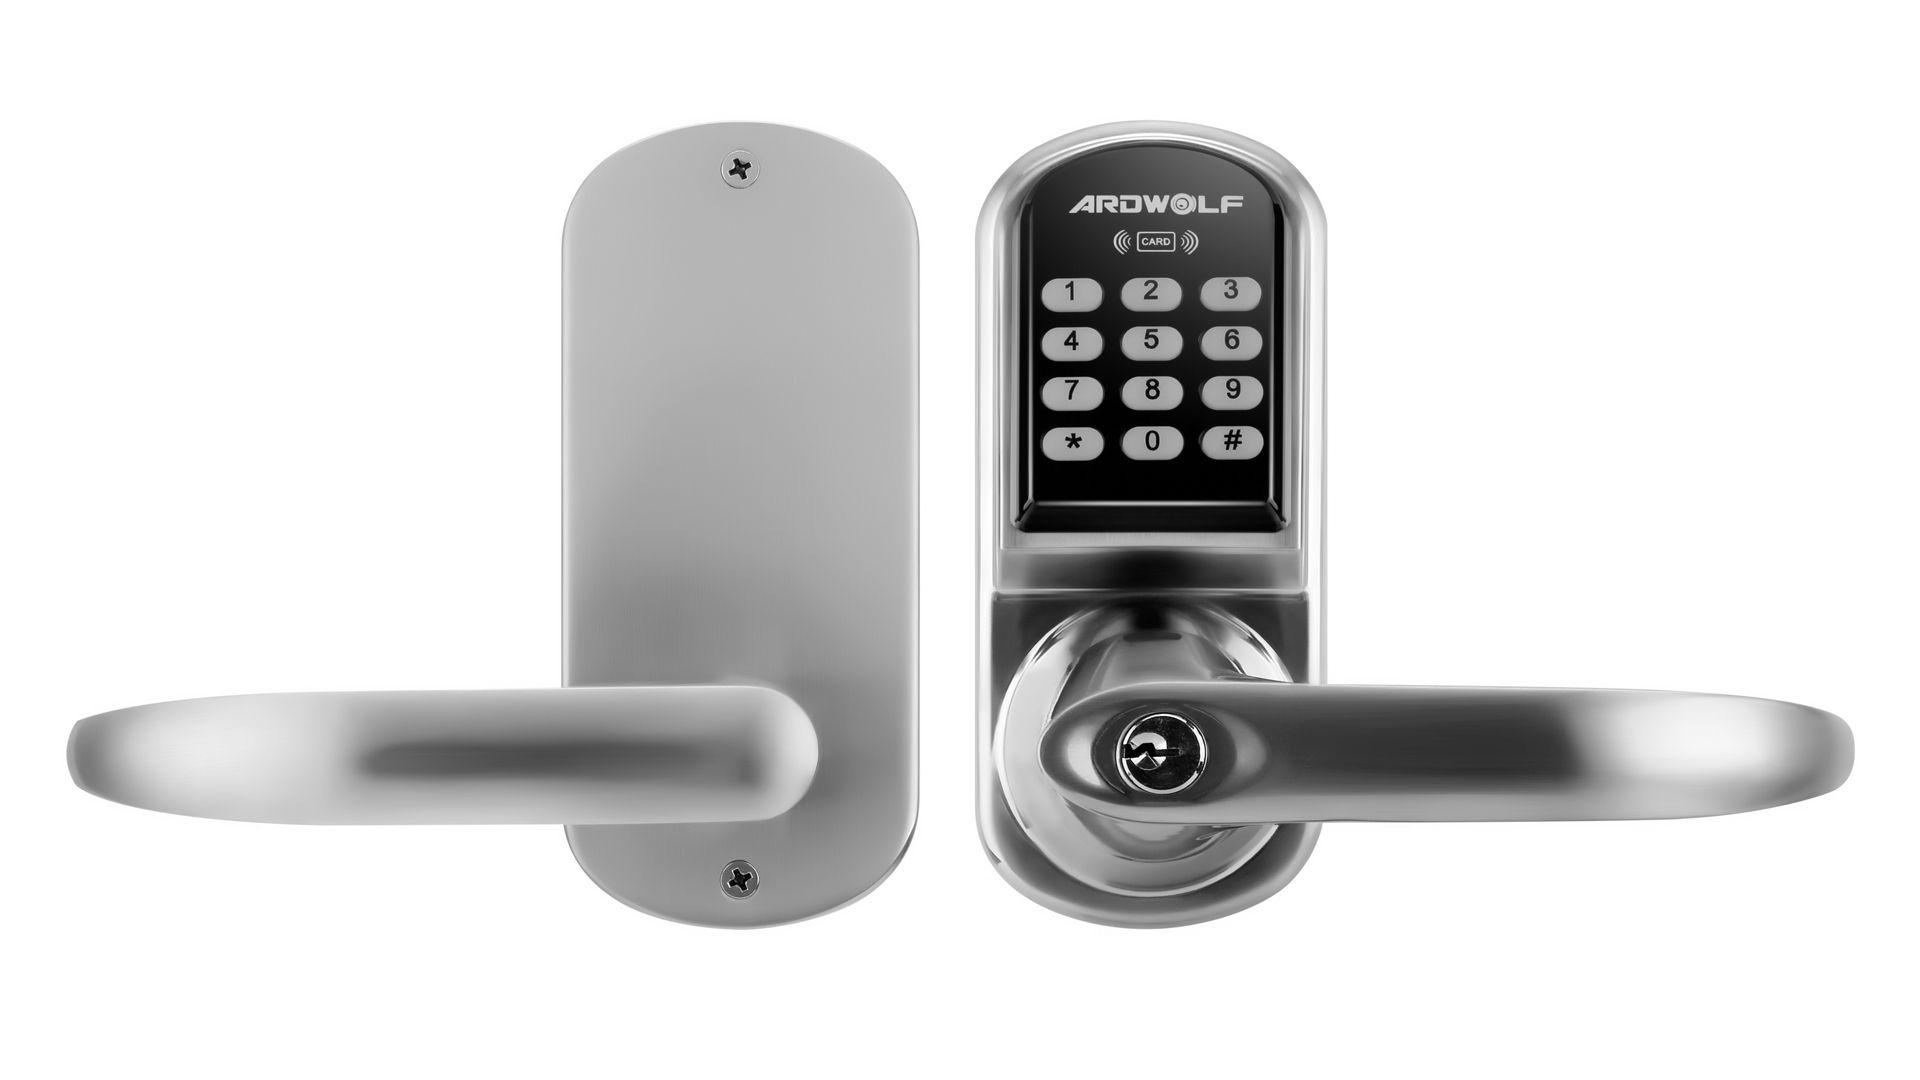 keyless ways fingerprint door smart keypad locks three code pin to ardwolf user electronic ultraloq for doors lock lever unlock touchscreen and